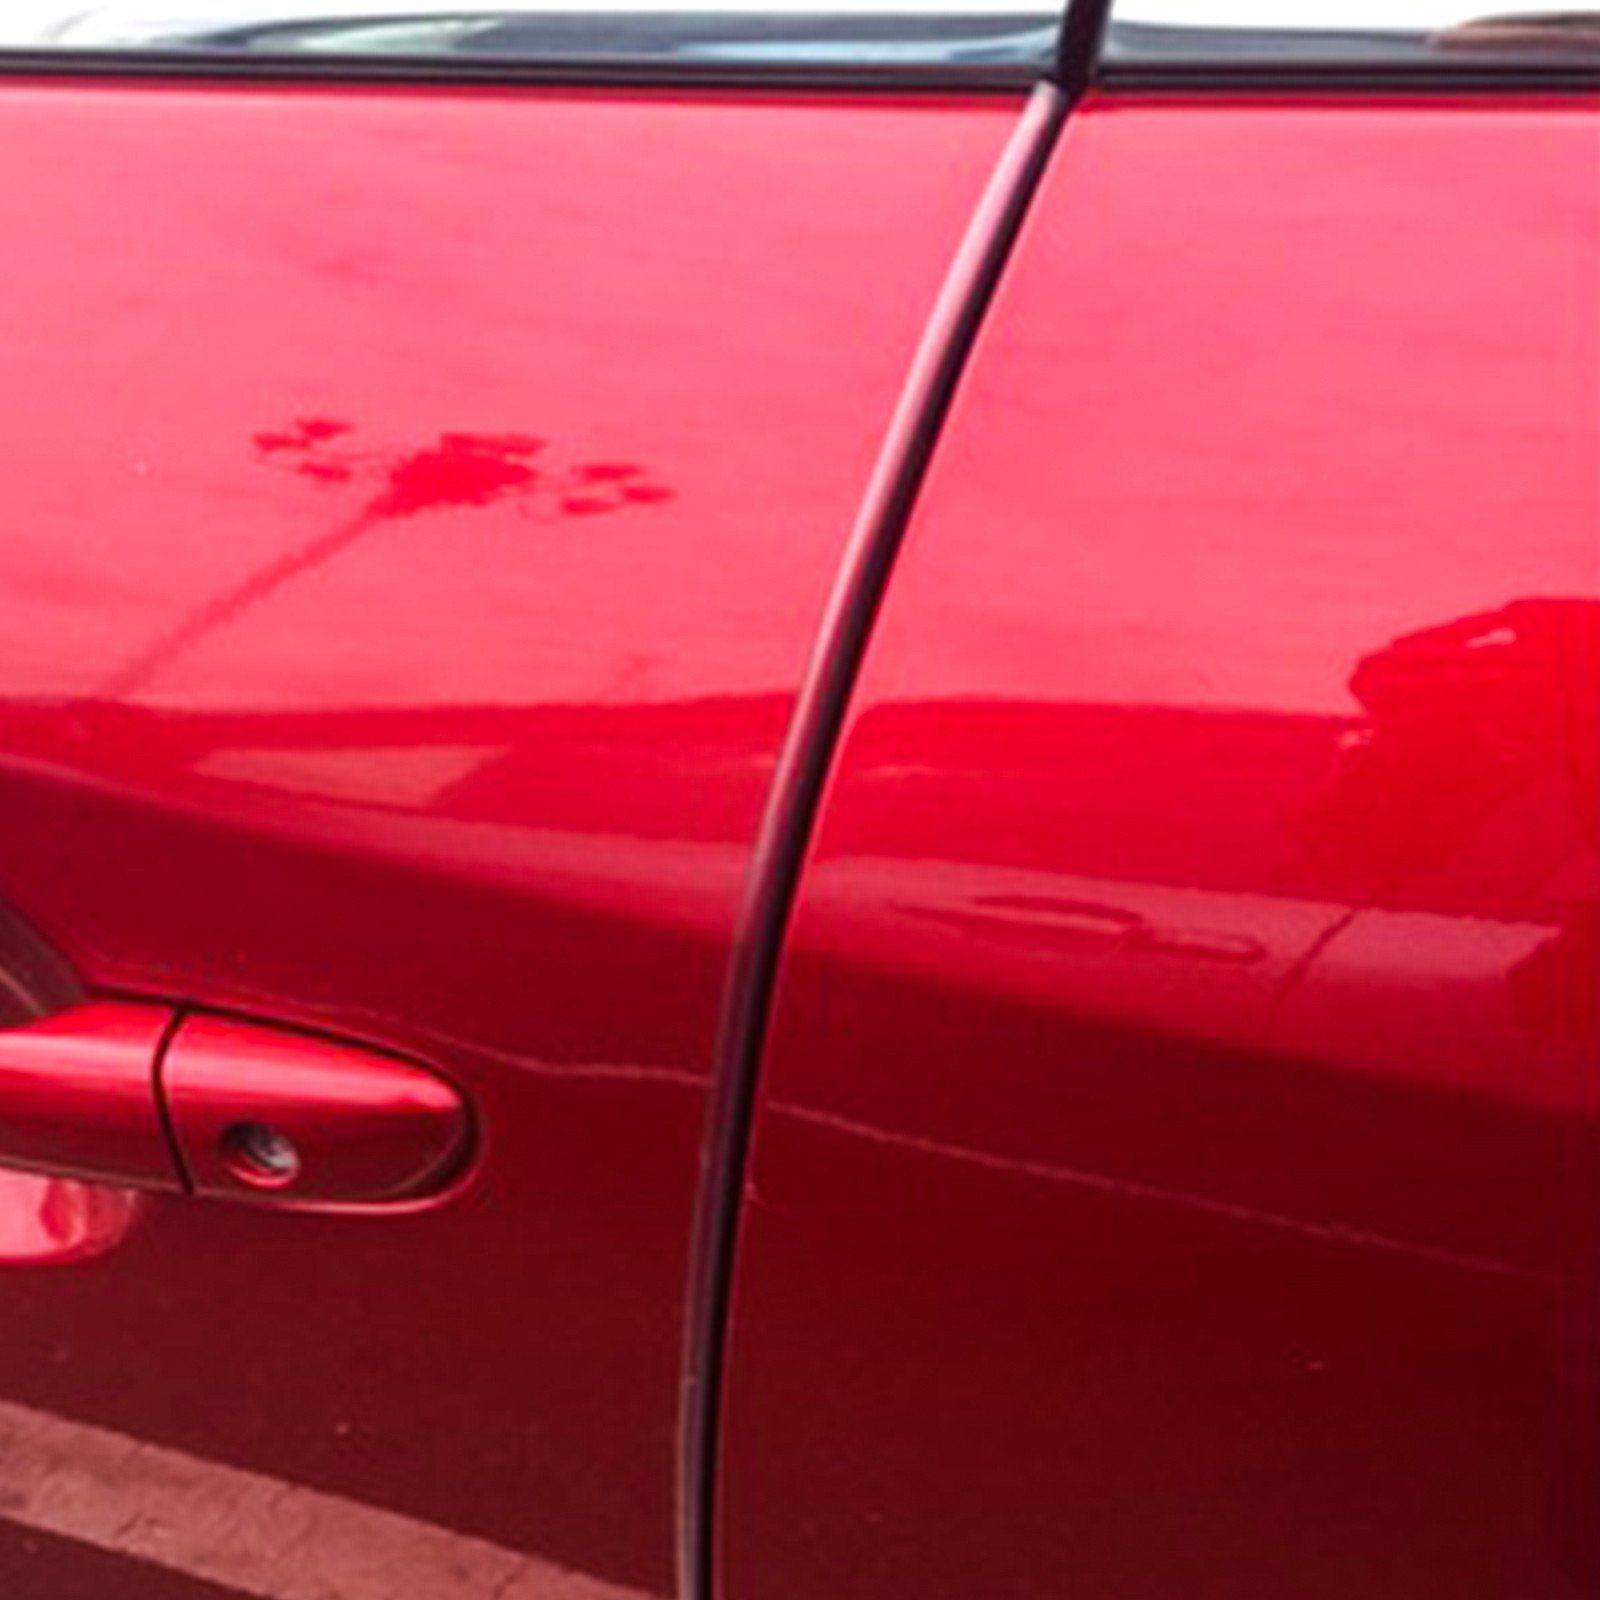 Car Door Protectors Edge Guards Clear 16ft 5m Car Edge Trim Rubber Seal Protector With U Shape Car Protection Door Ed Door Protector Car Protection Edge Guard